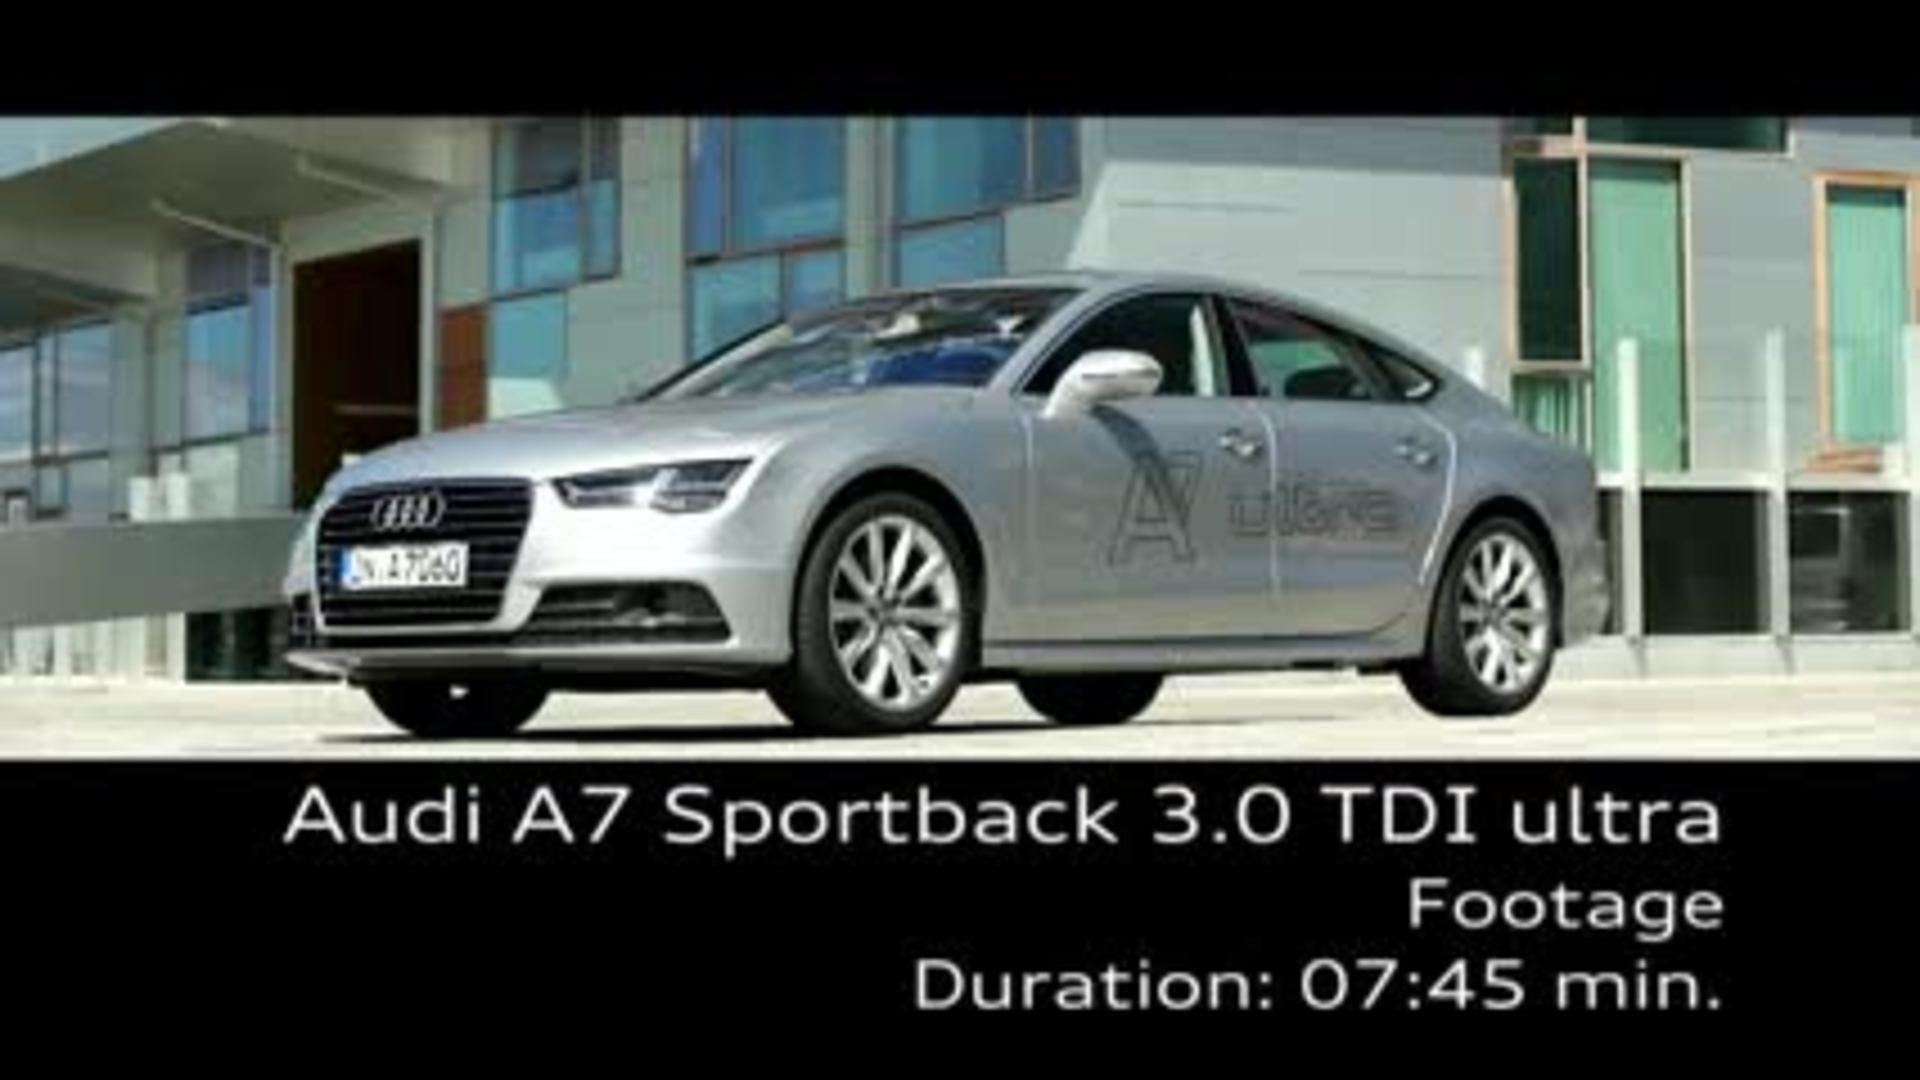 The Audi A7 Sportback TDI ultra - Footage